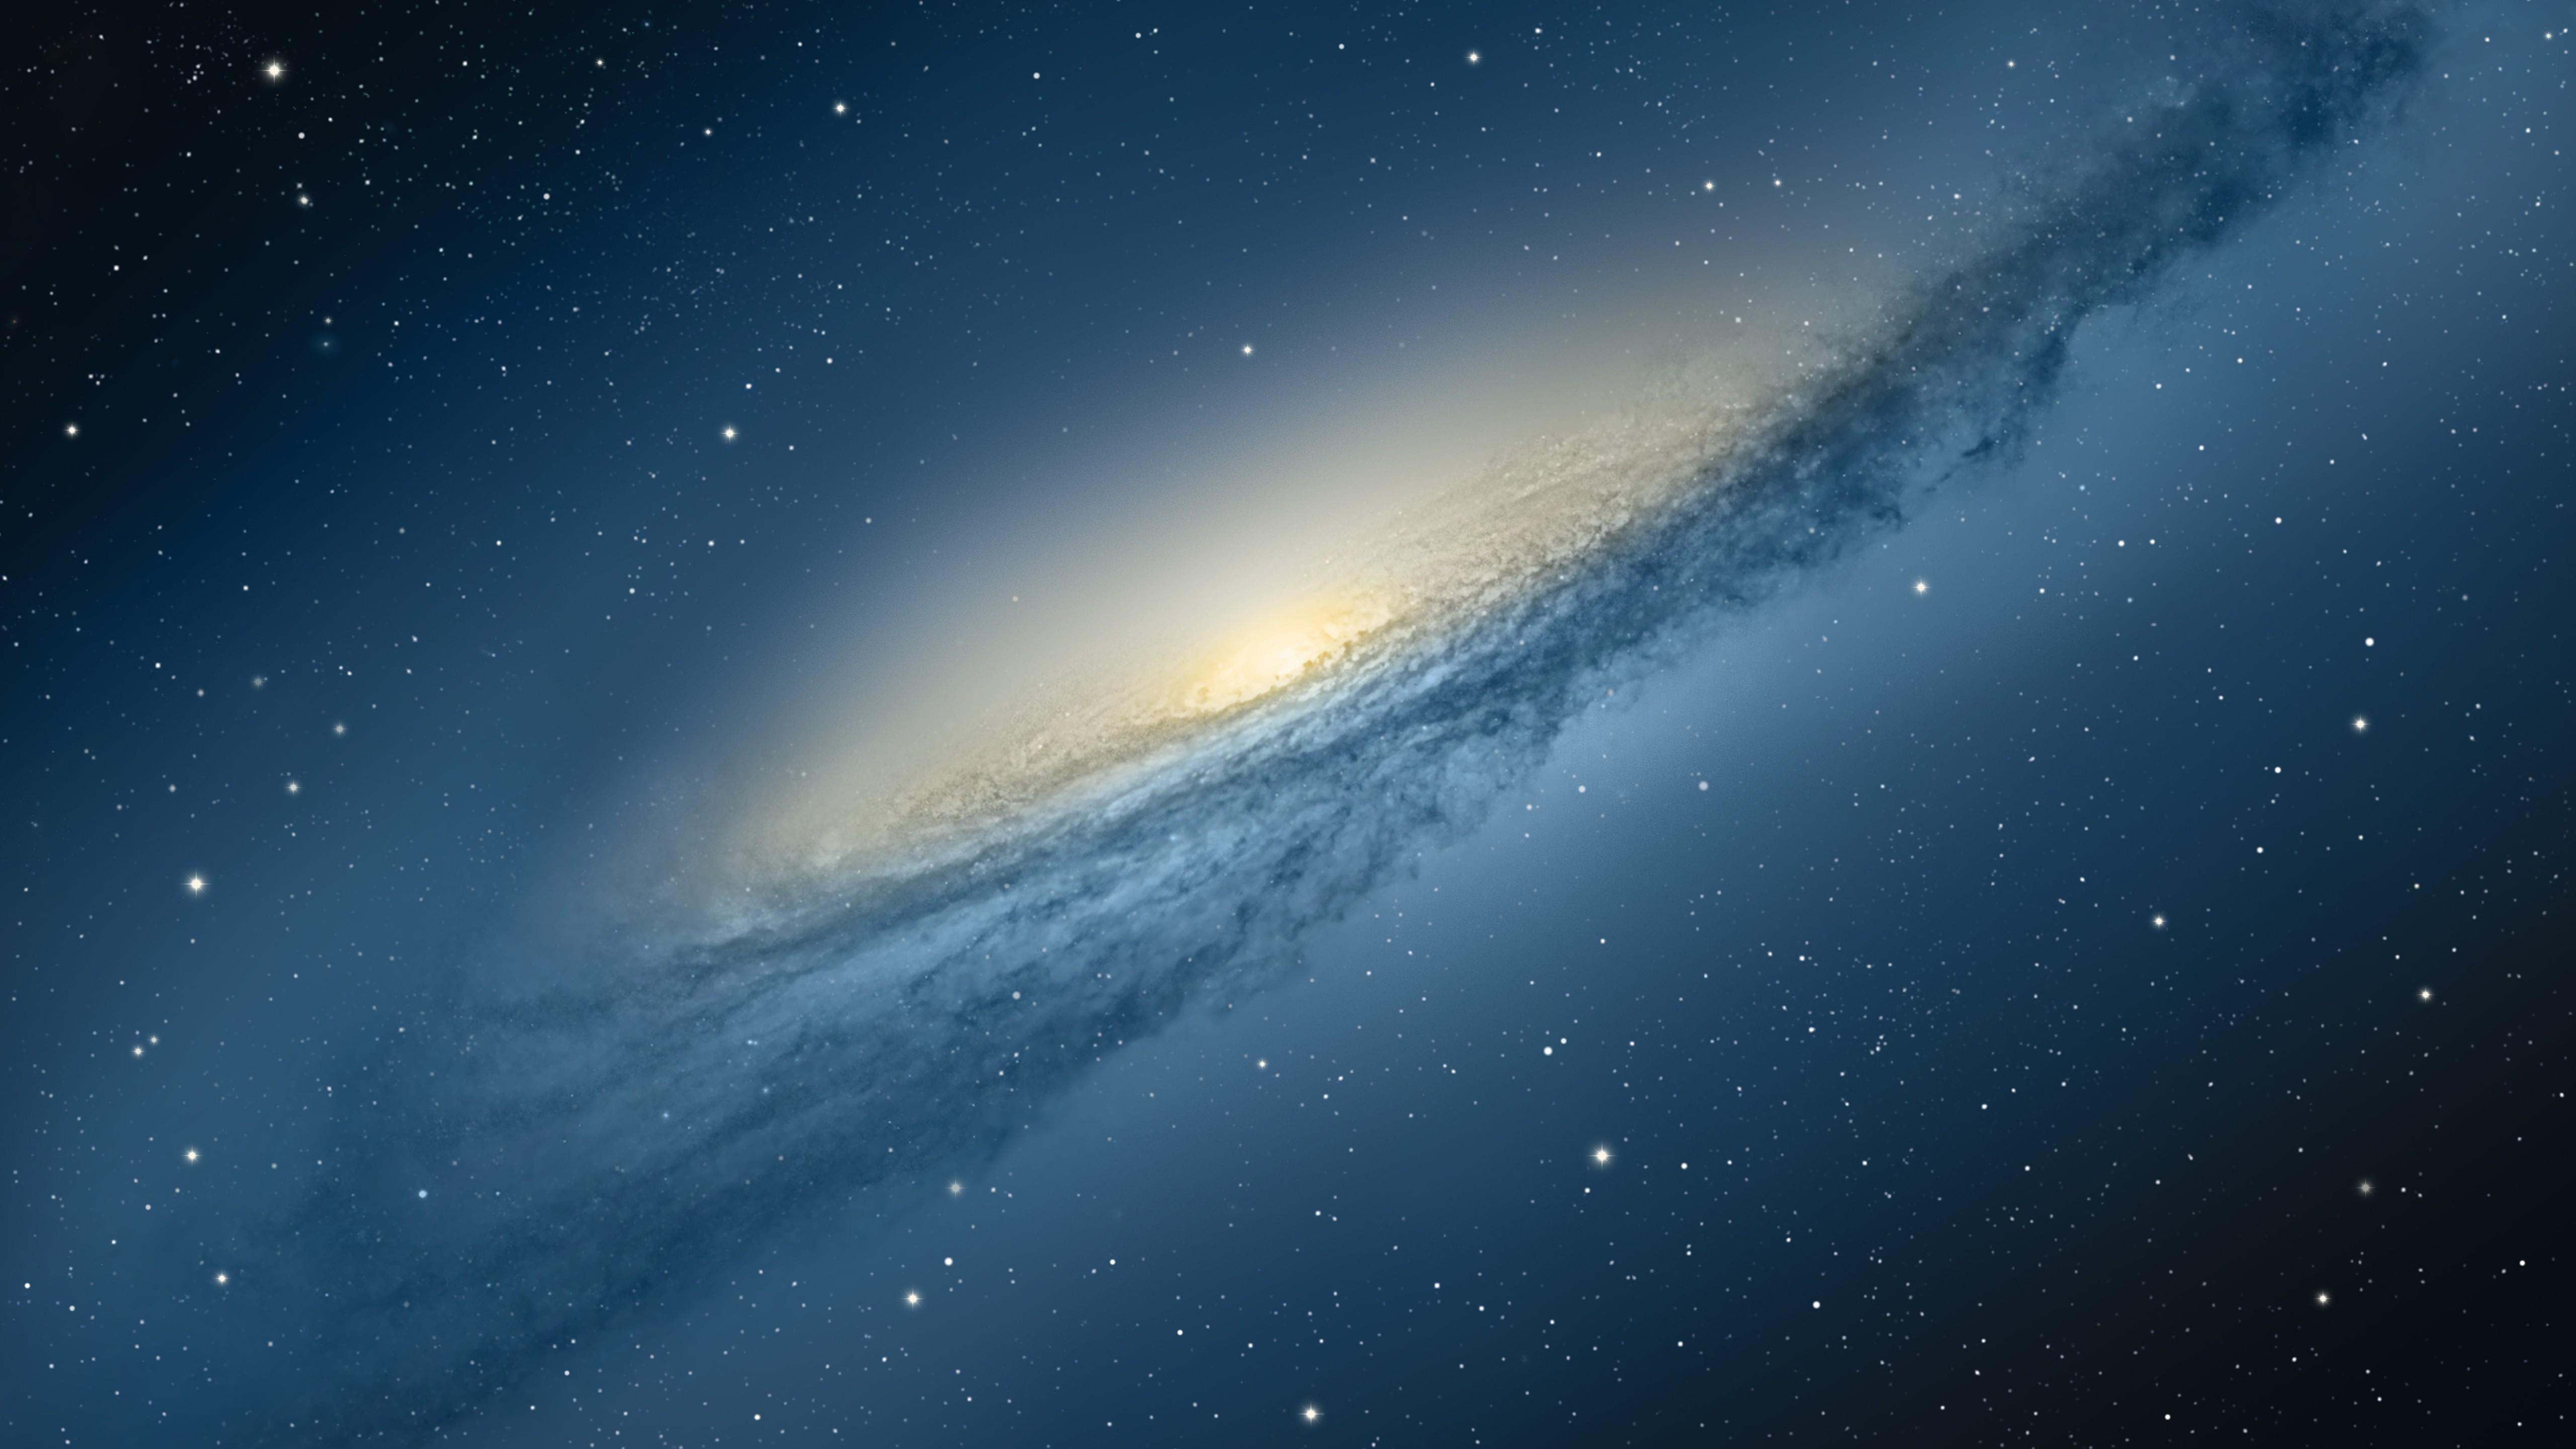 General 5120x2880 space stars blue digital art galaxy space art NGC 3190